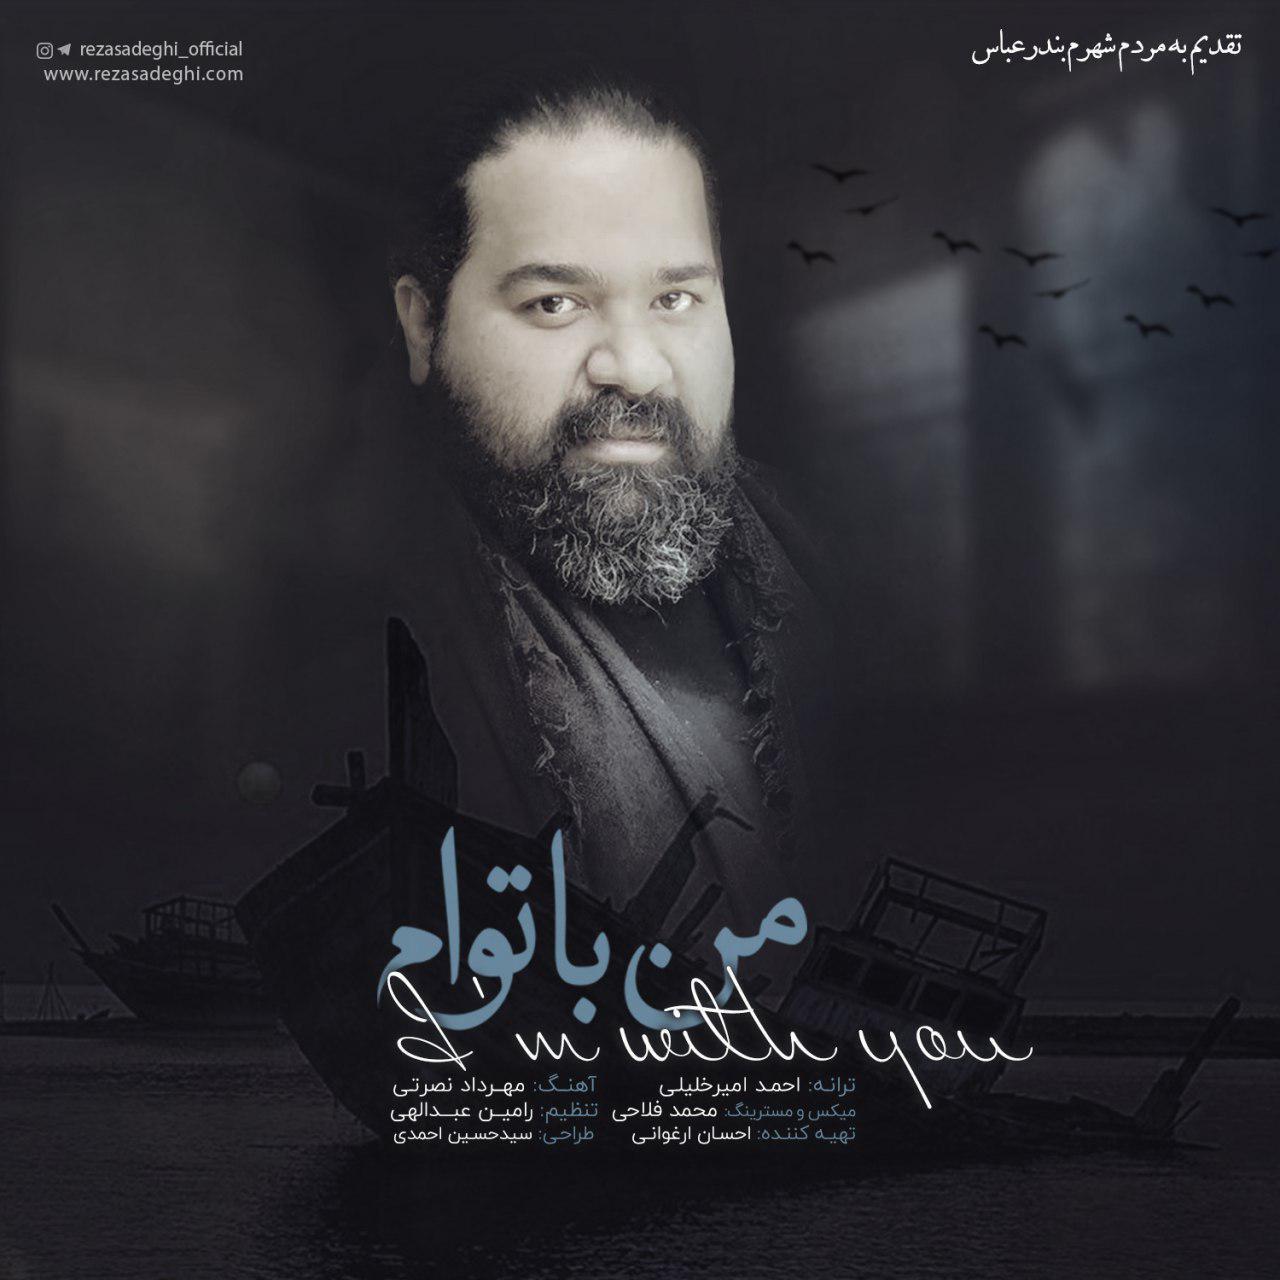 Reza Sadeghi Man Ba Toam (Im With You) - دانلود آهنگ جدید رضا صادقی به نام من با توام